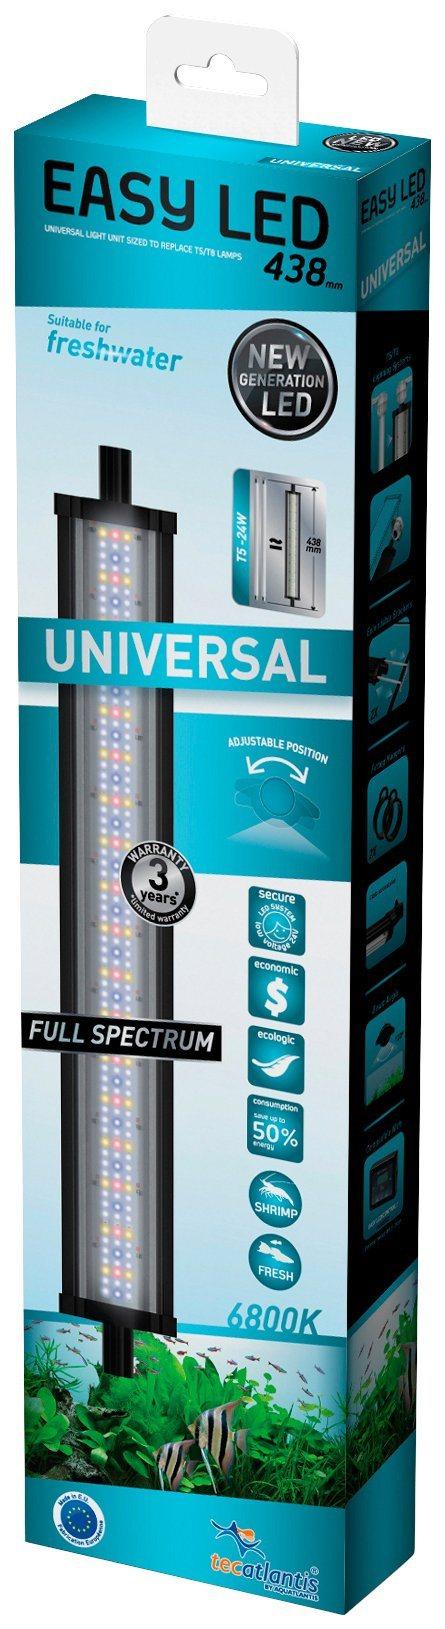 Aquarium LED-Beleuchtung »Easy LED Universal Süßwasser«, 20 Watt / 438 mm